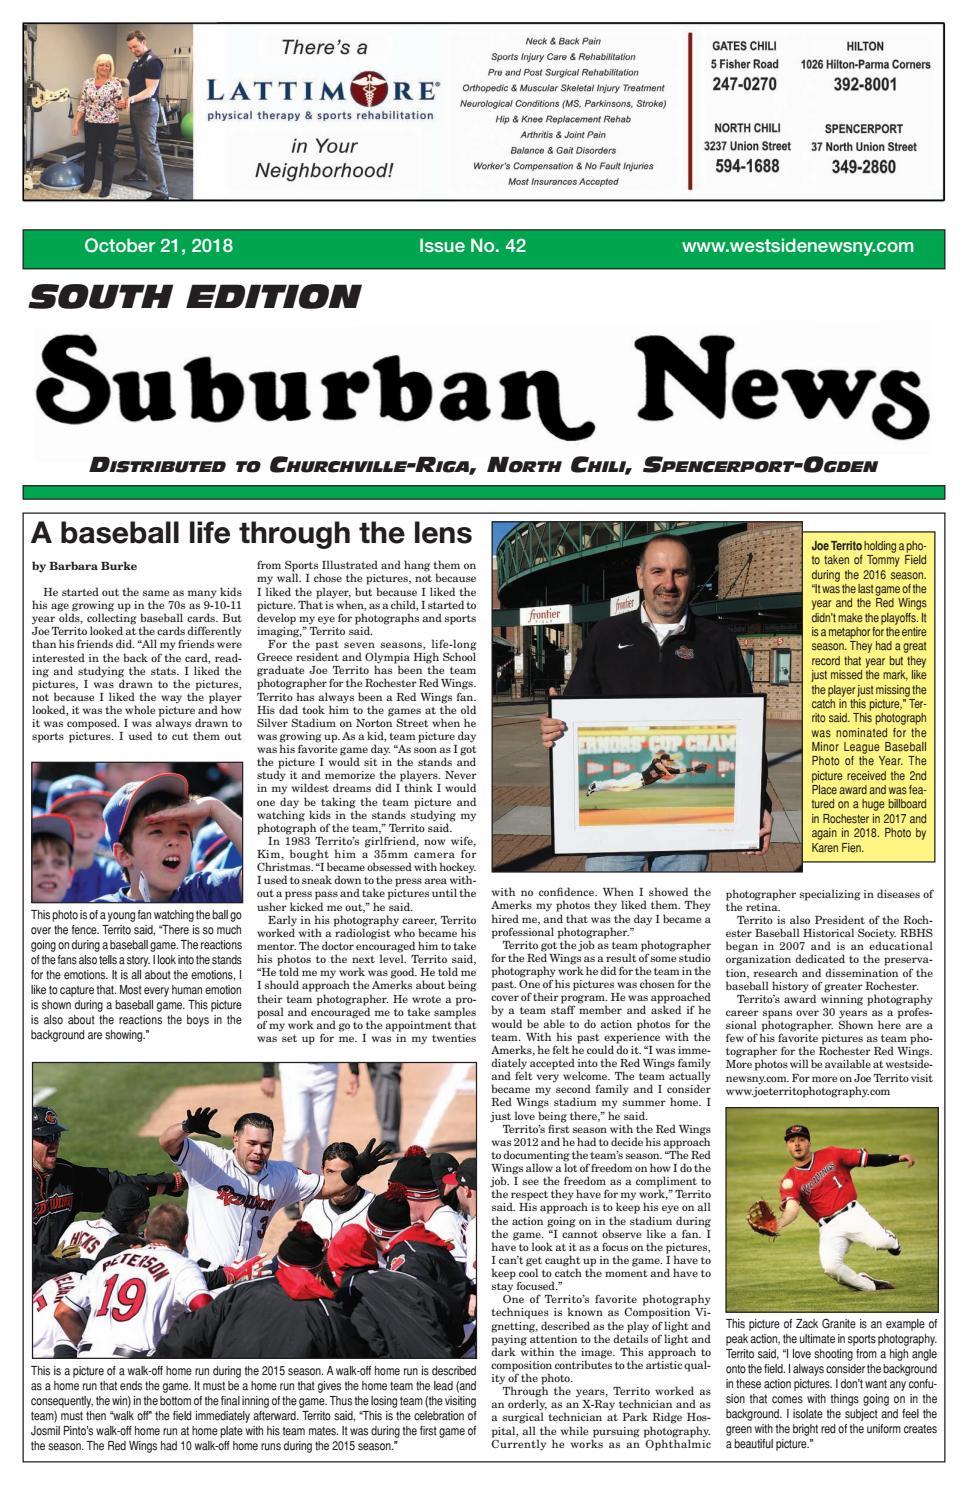 Pastoe Fibre Tv Kast.Suburban News South Edition October 21 2018 By Westside News